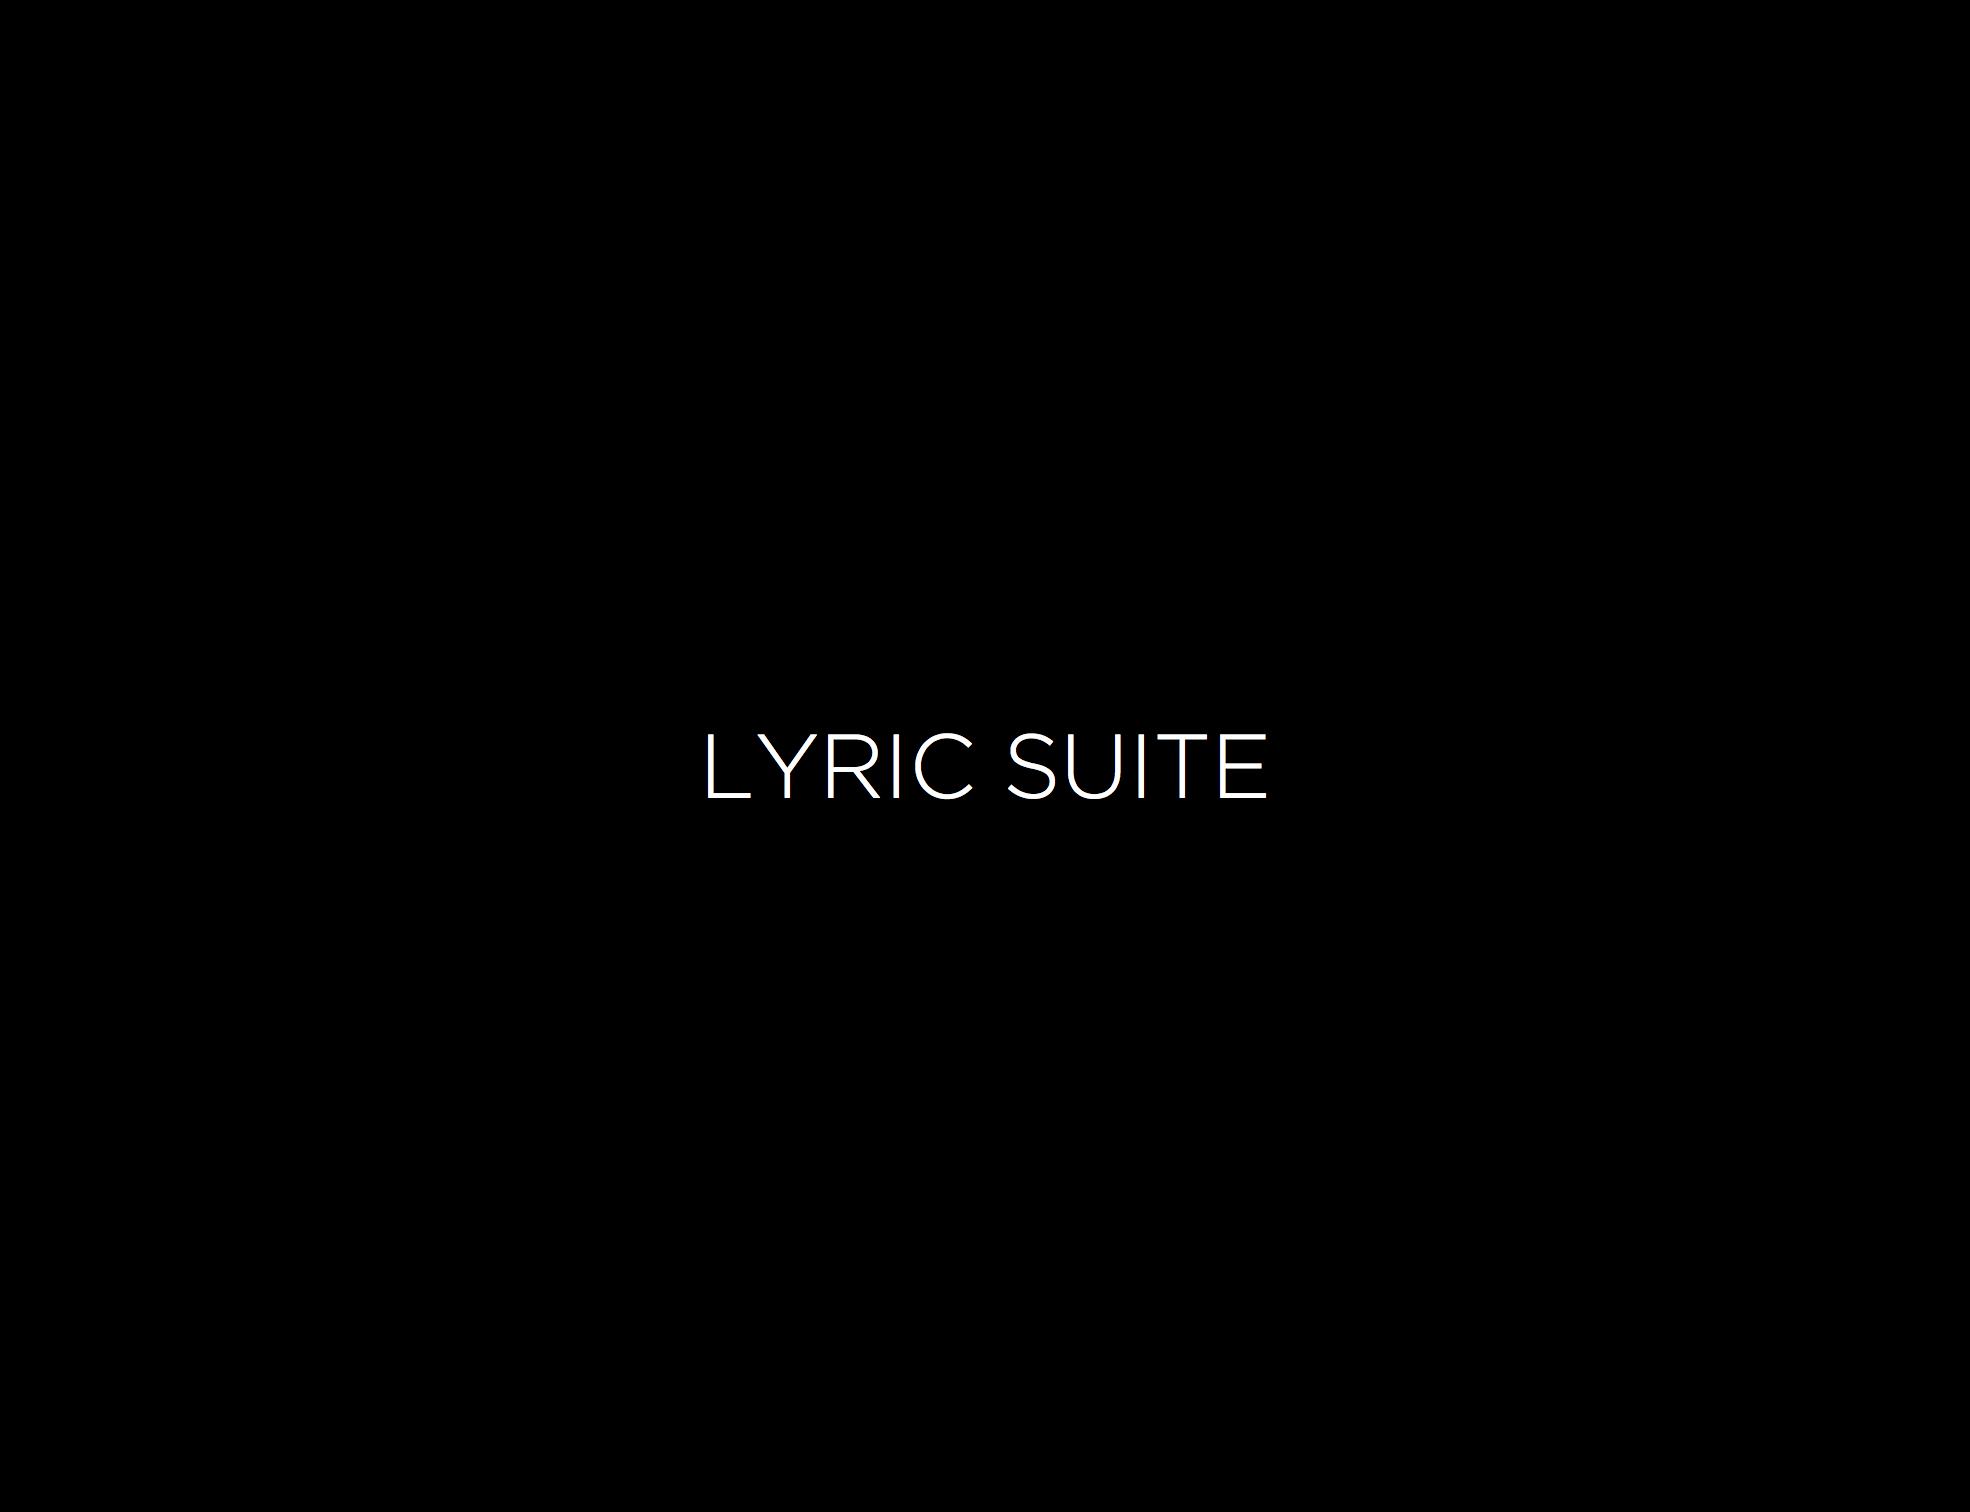 lyric suite.png